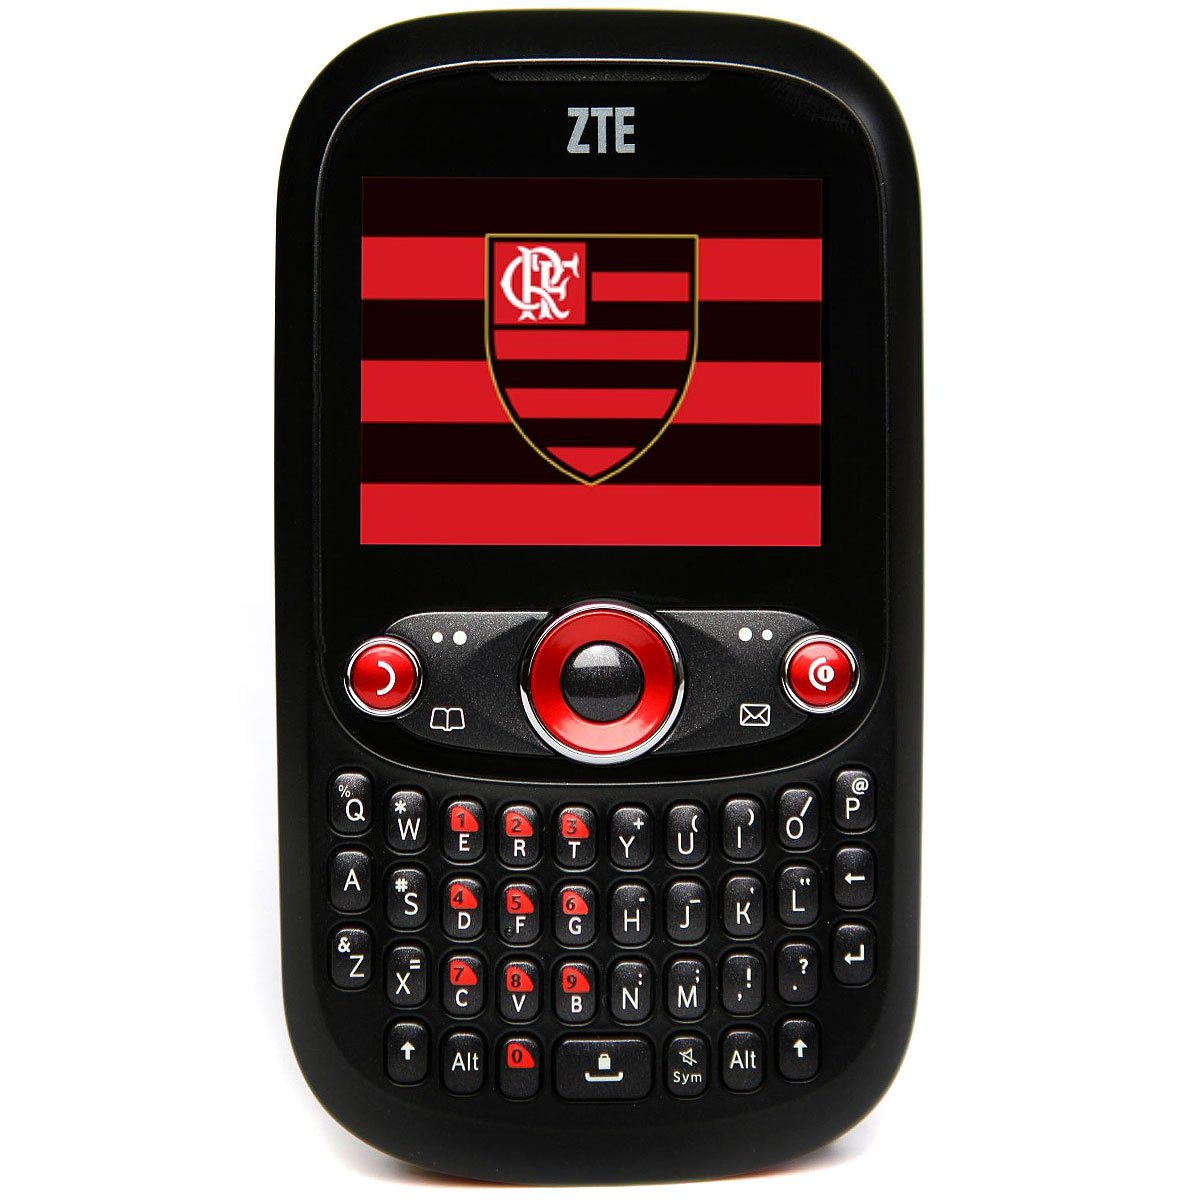 Celular Zte Flamengo R236 Preto